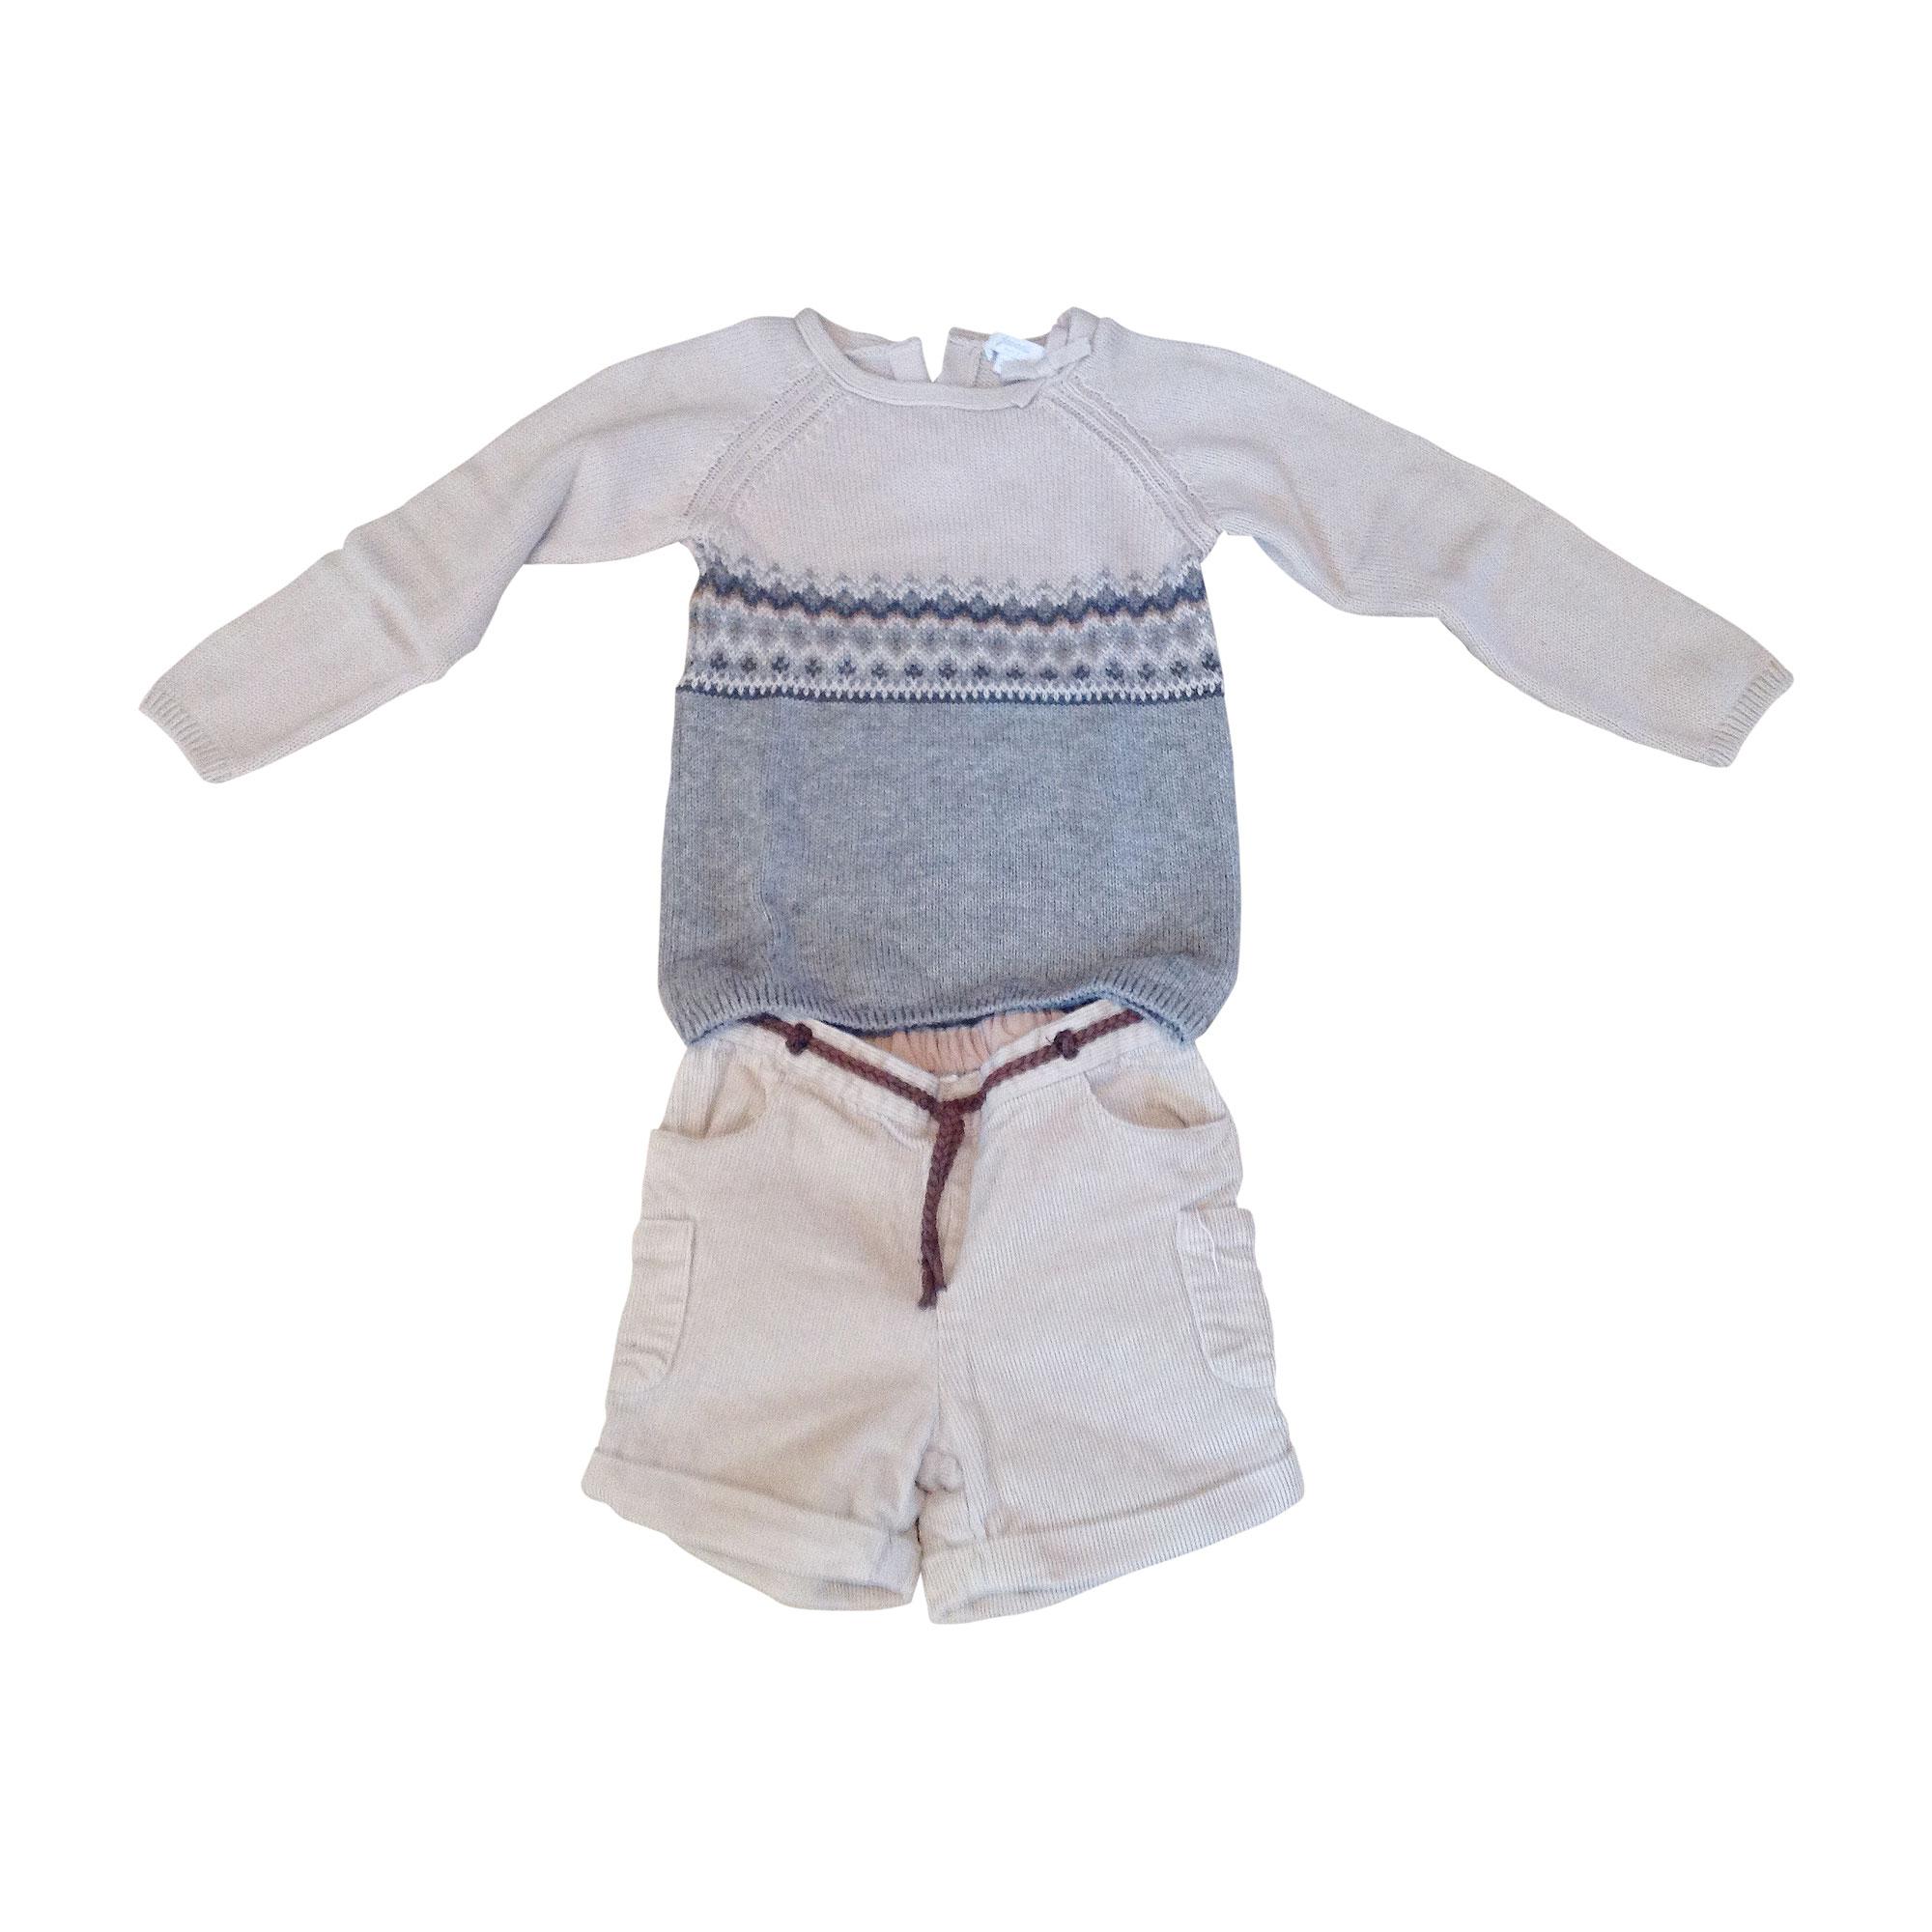 Anzug, Set für Kinder, kurz JACADI Beige